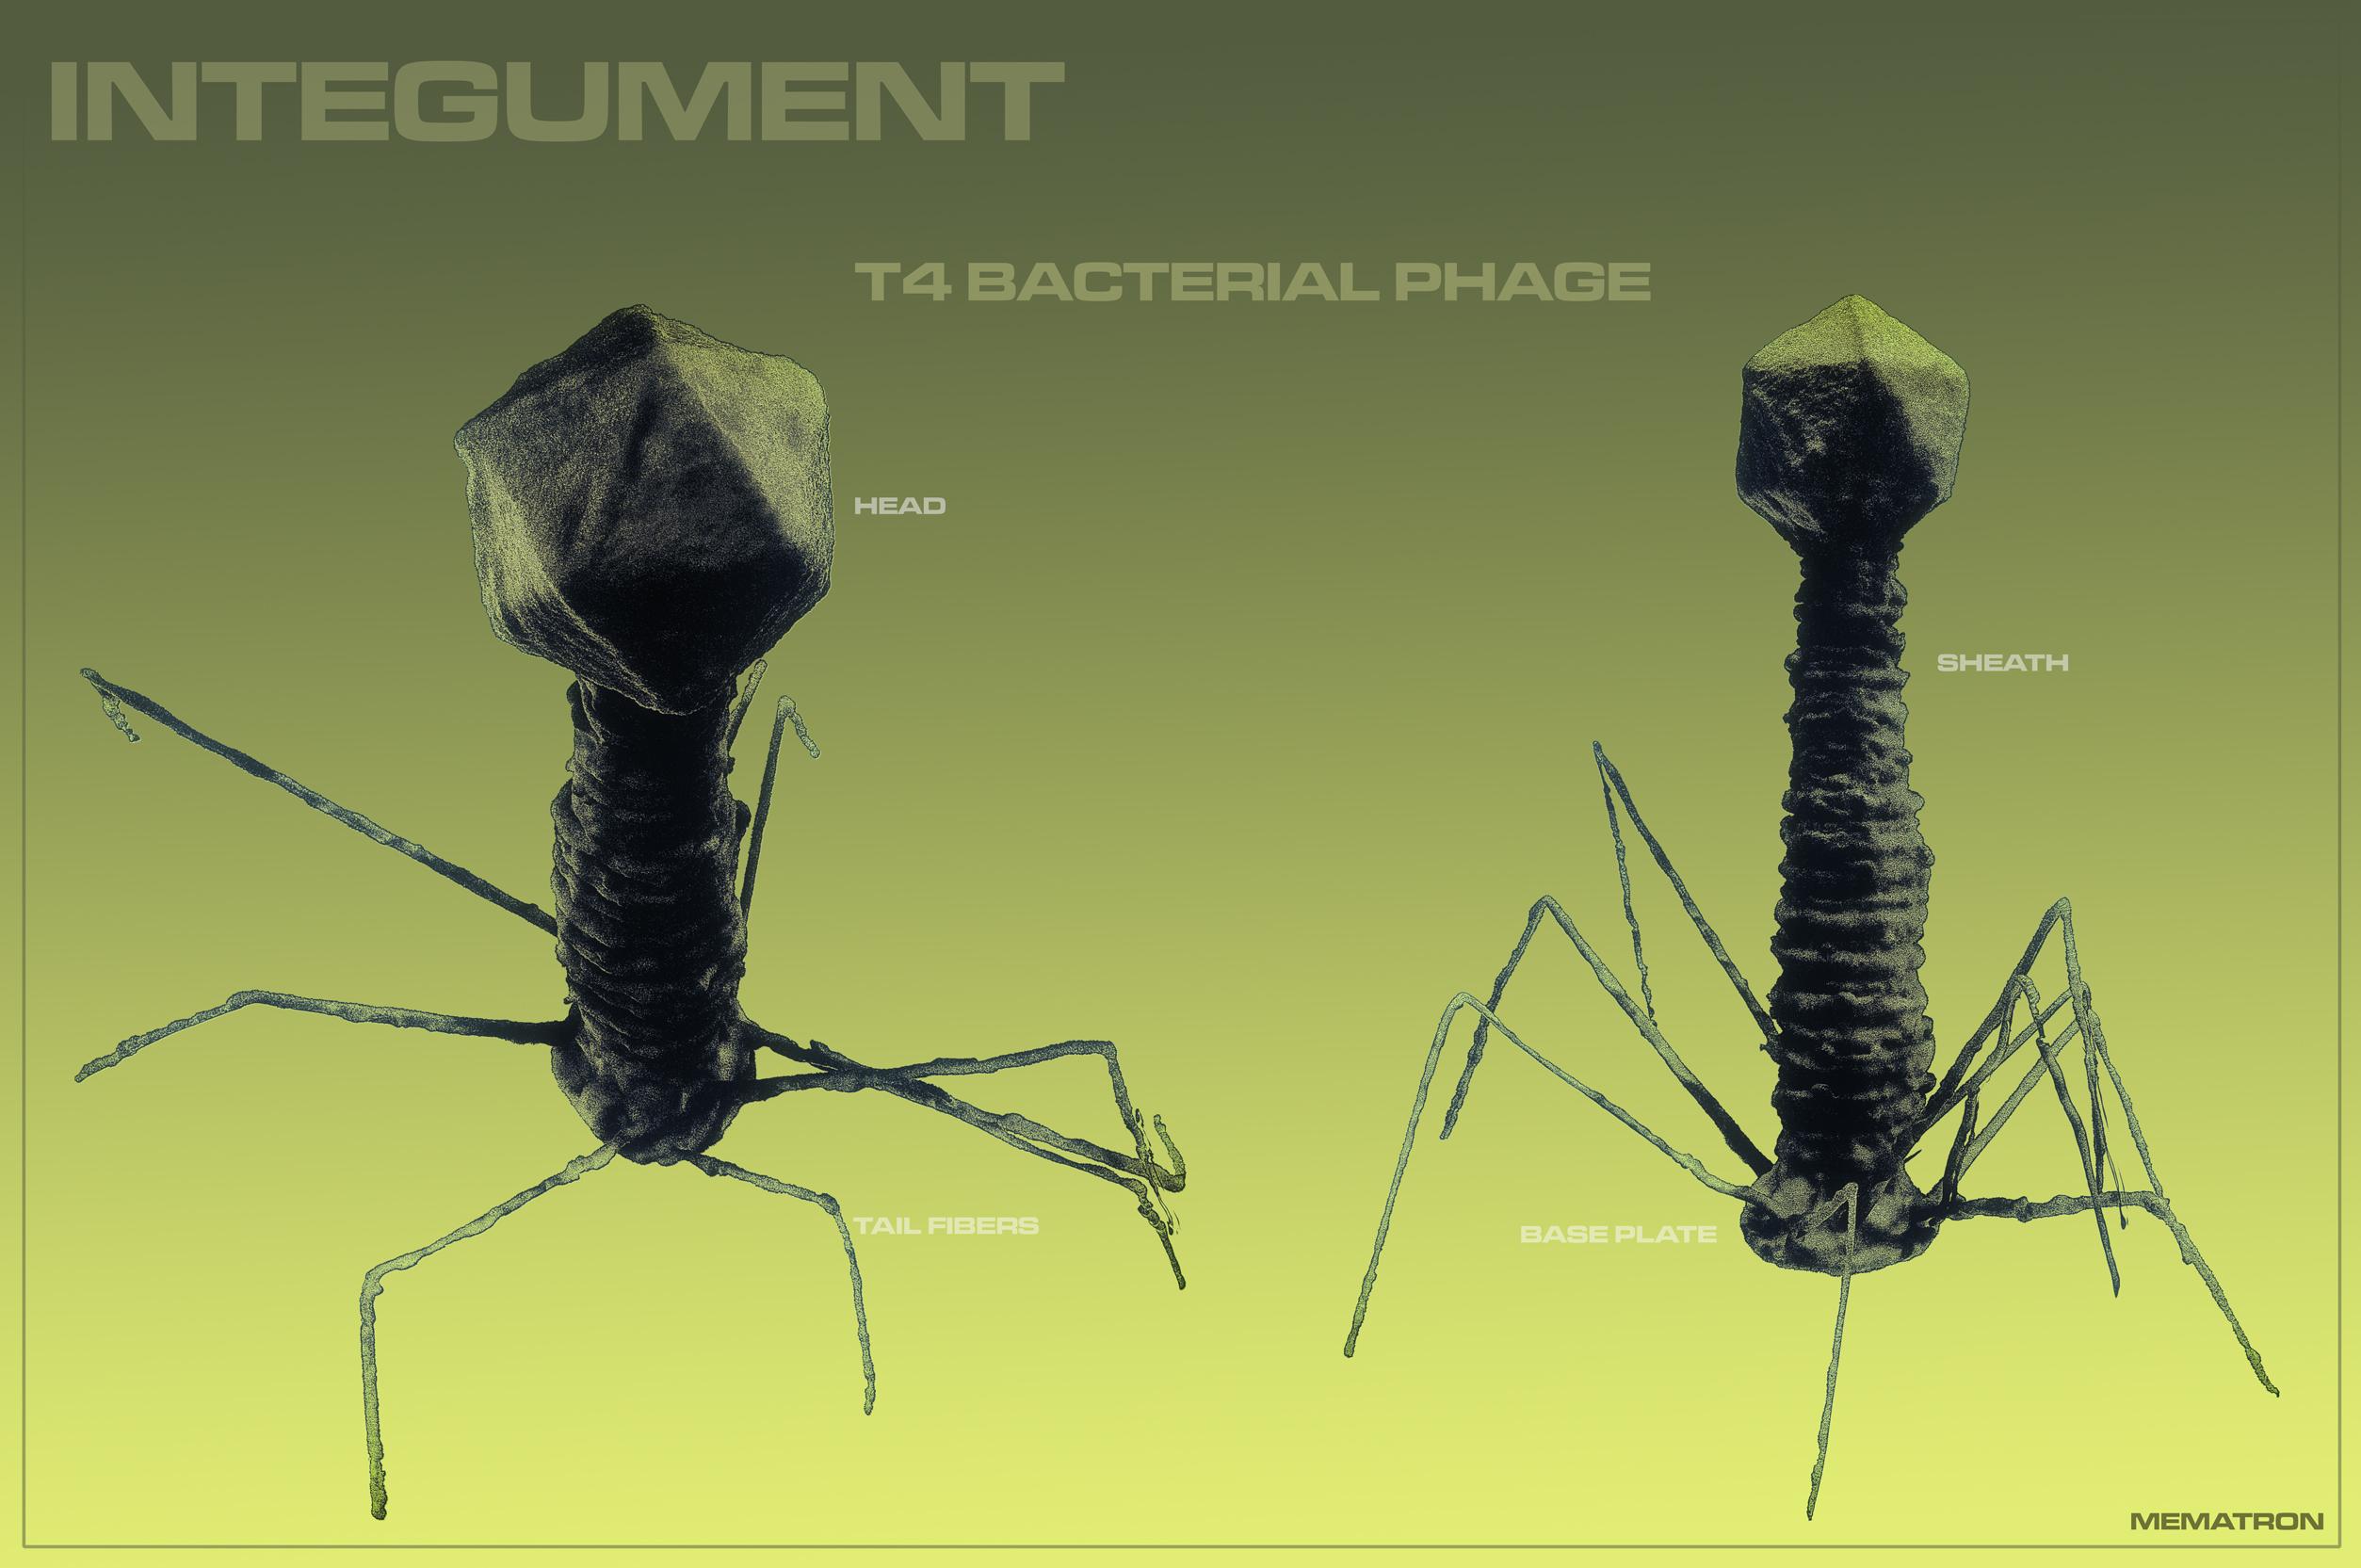 T4 Bacterial Phage